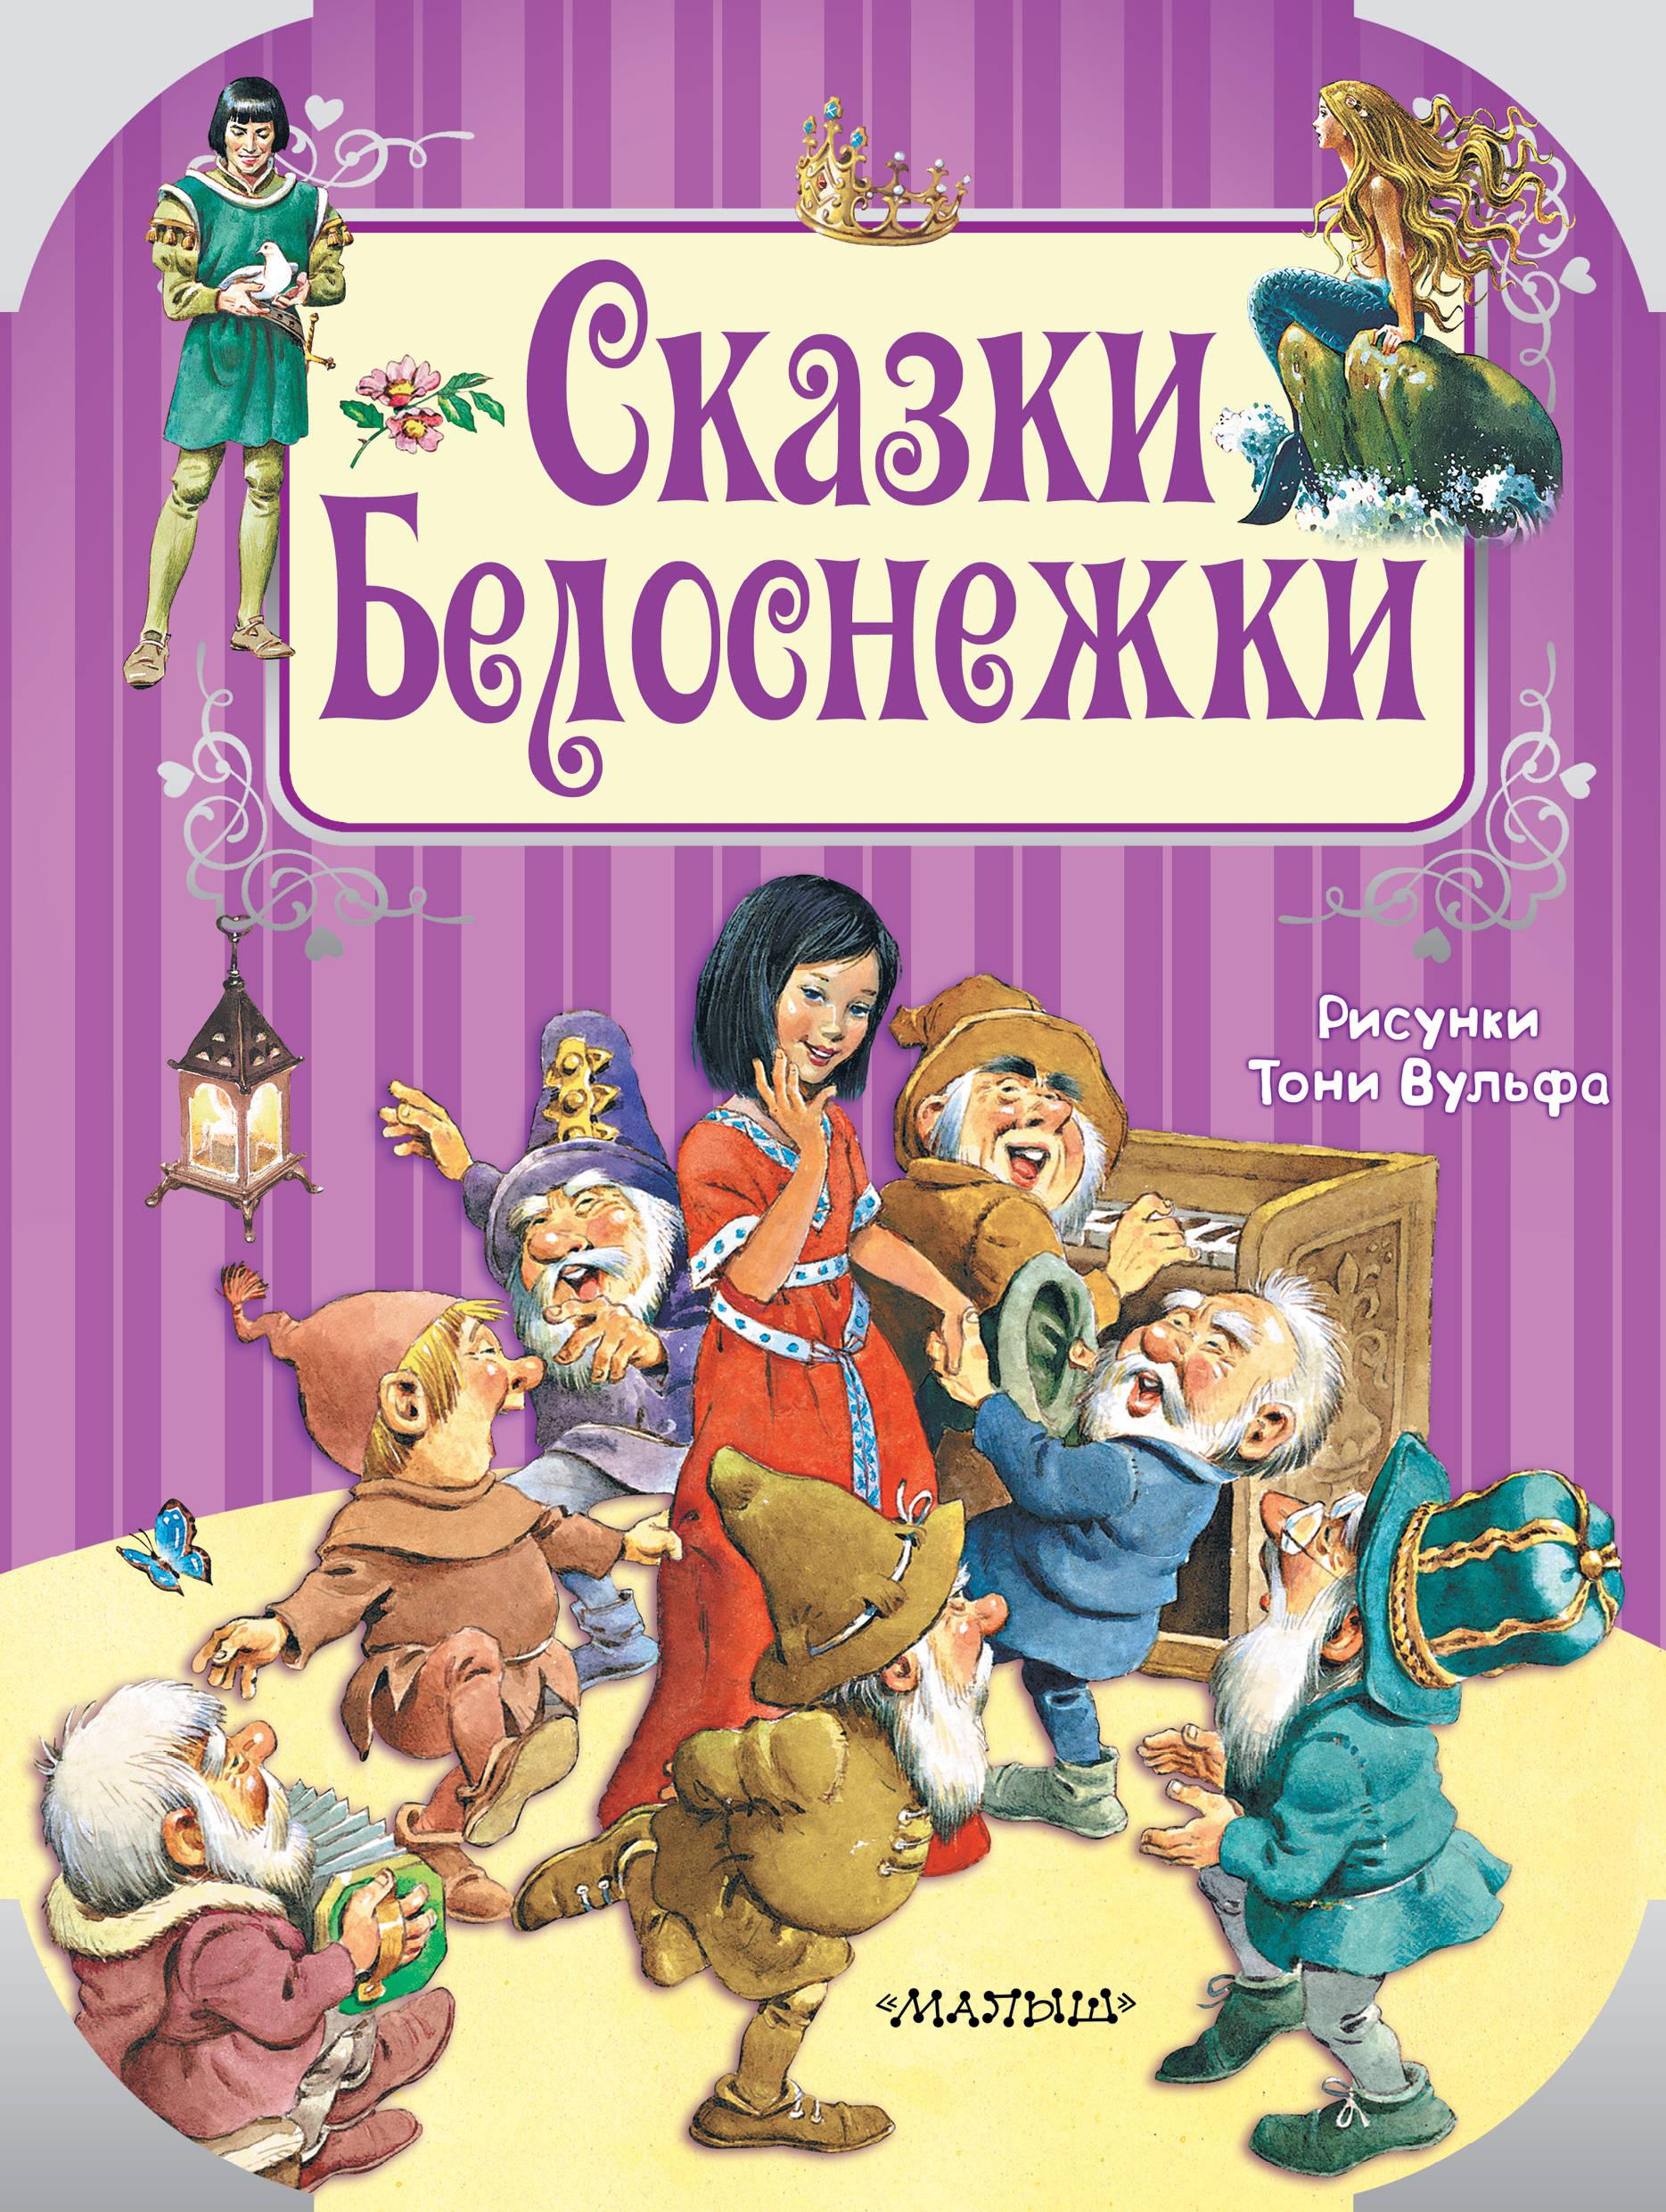 Сказки Белоснежки костюм сказочной белоснежки 44